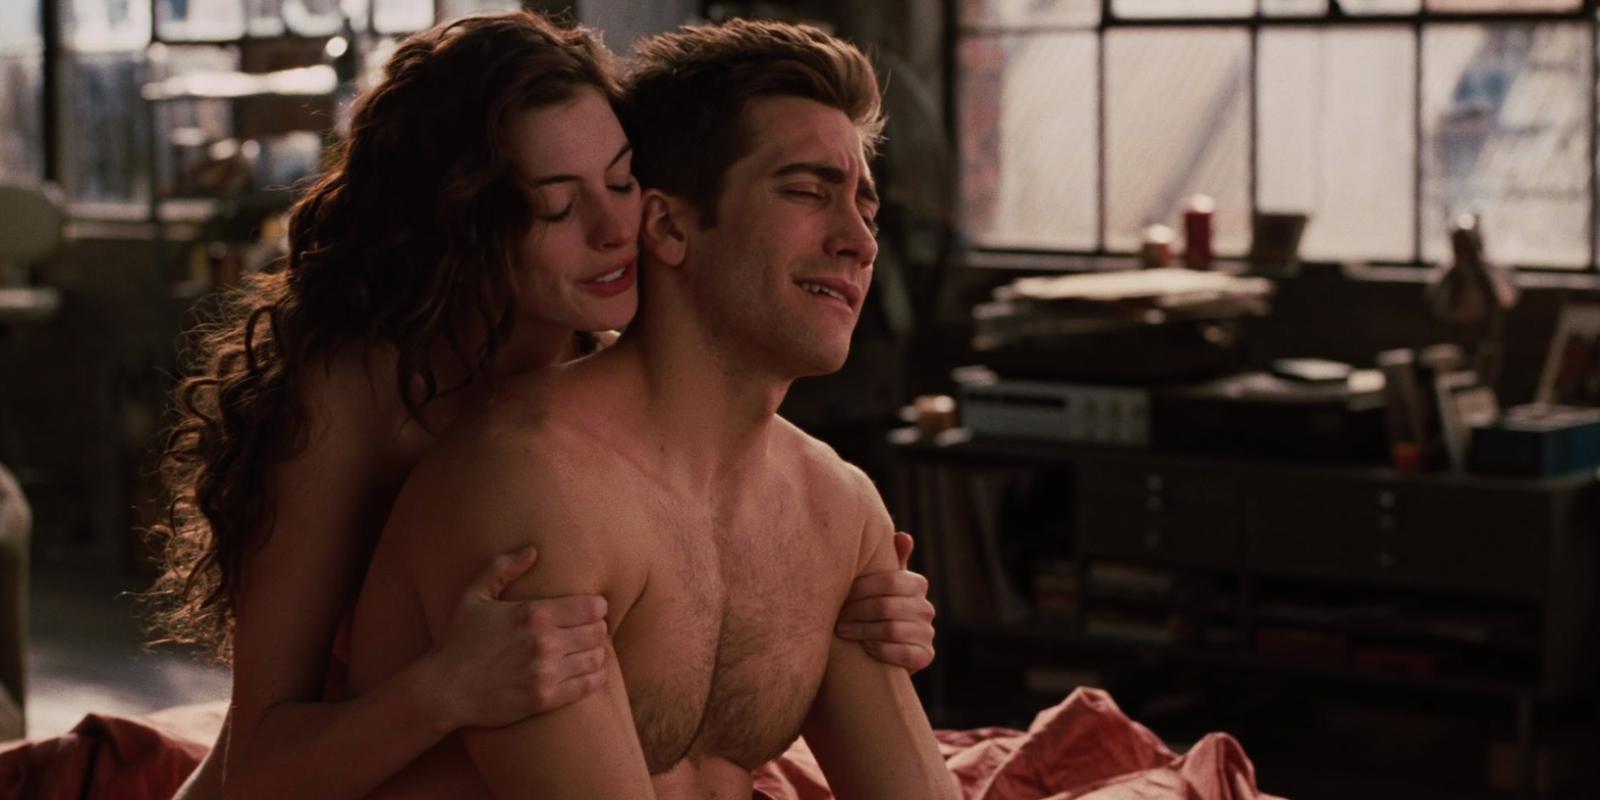 film erotico migliore meetic touch